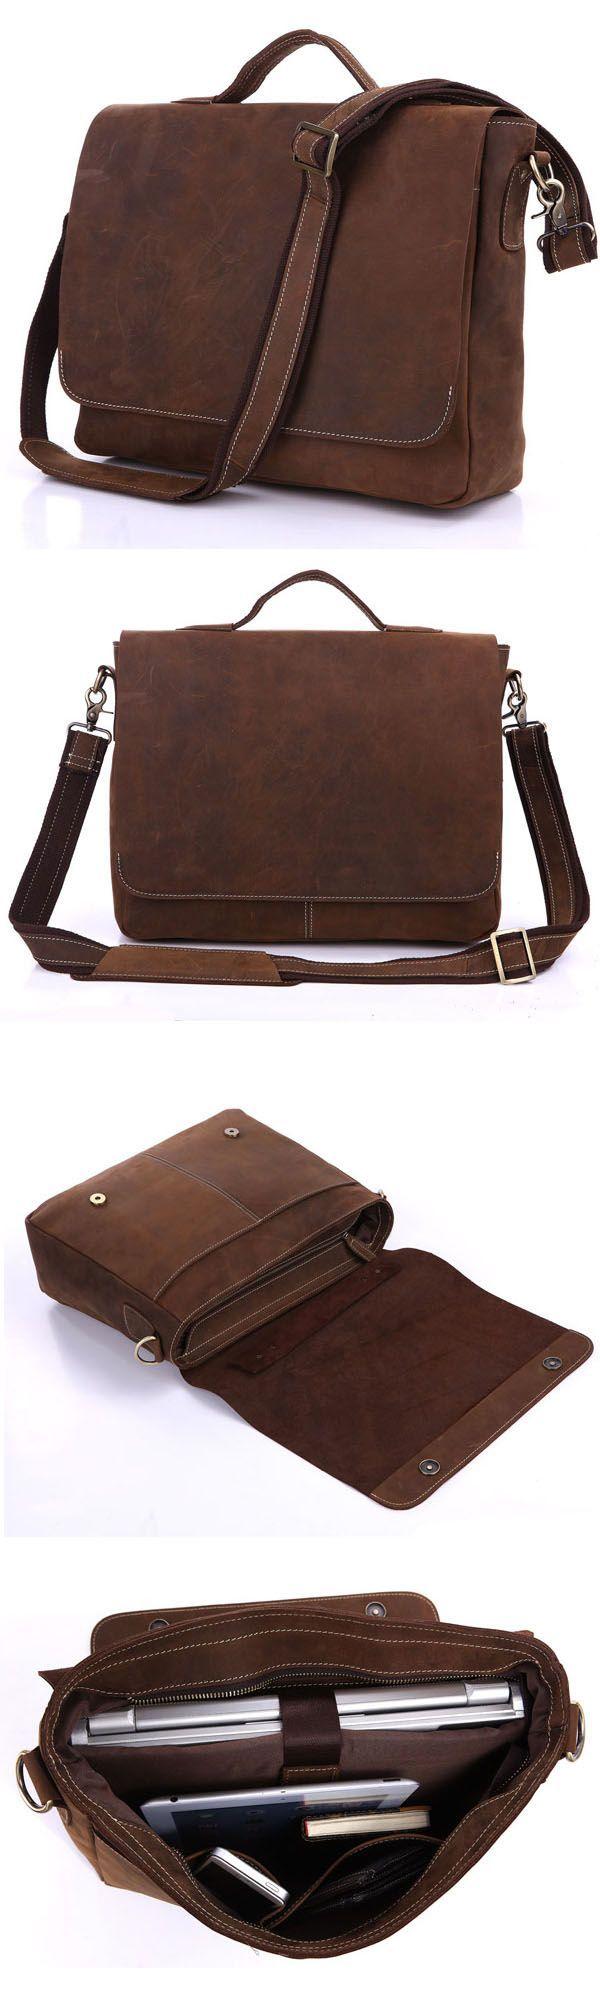 Best 25  Messenger bags ideas on Pinterest | Leather messenger ...